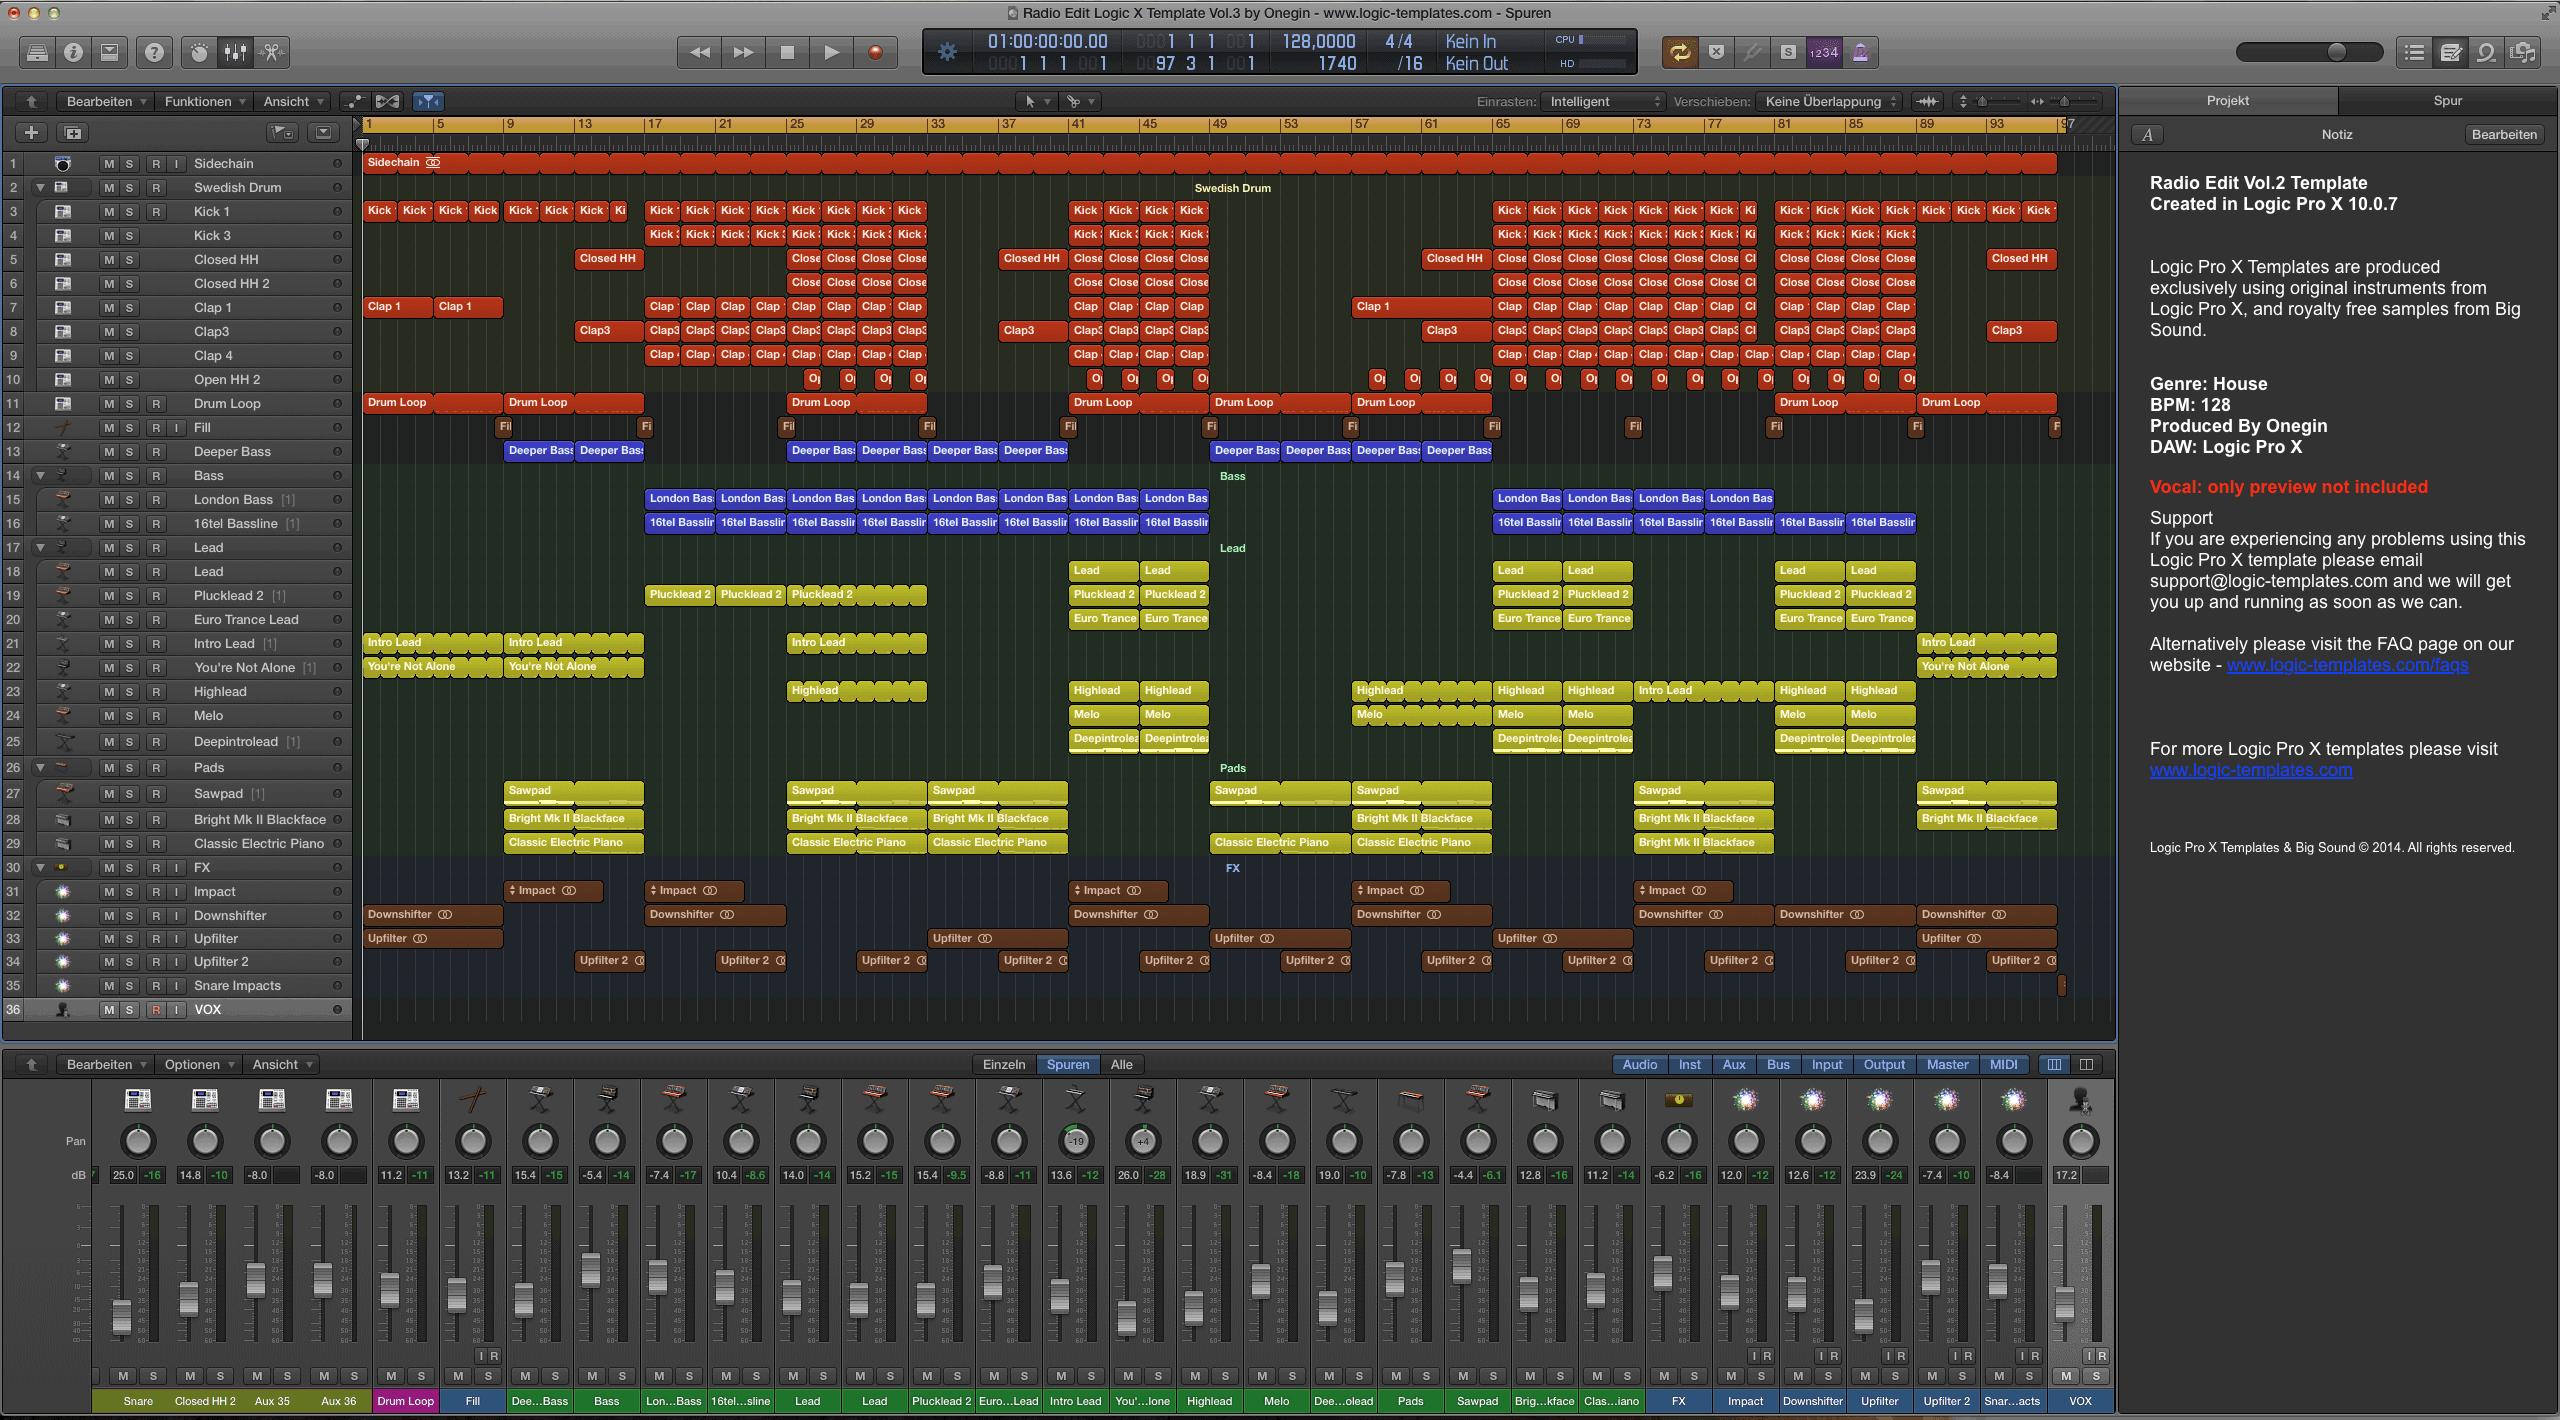 Radio Edit Logic X Template Vol.3 by Onegin